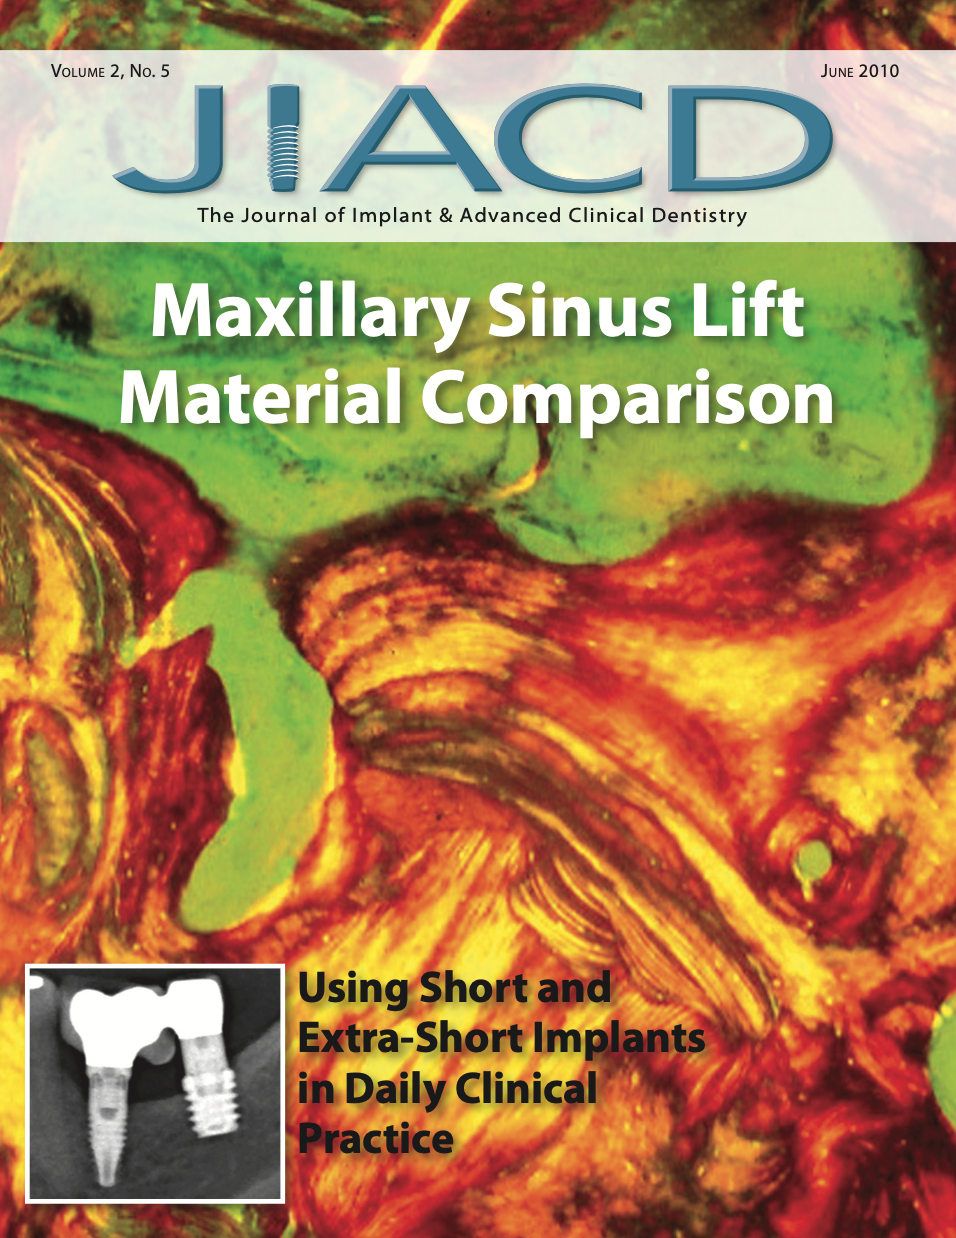 Maxillary Sinus Lift Material Comparison